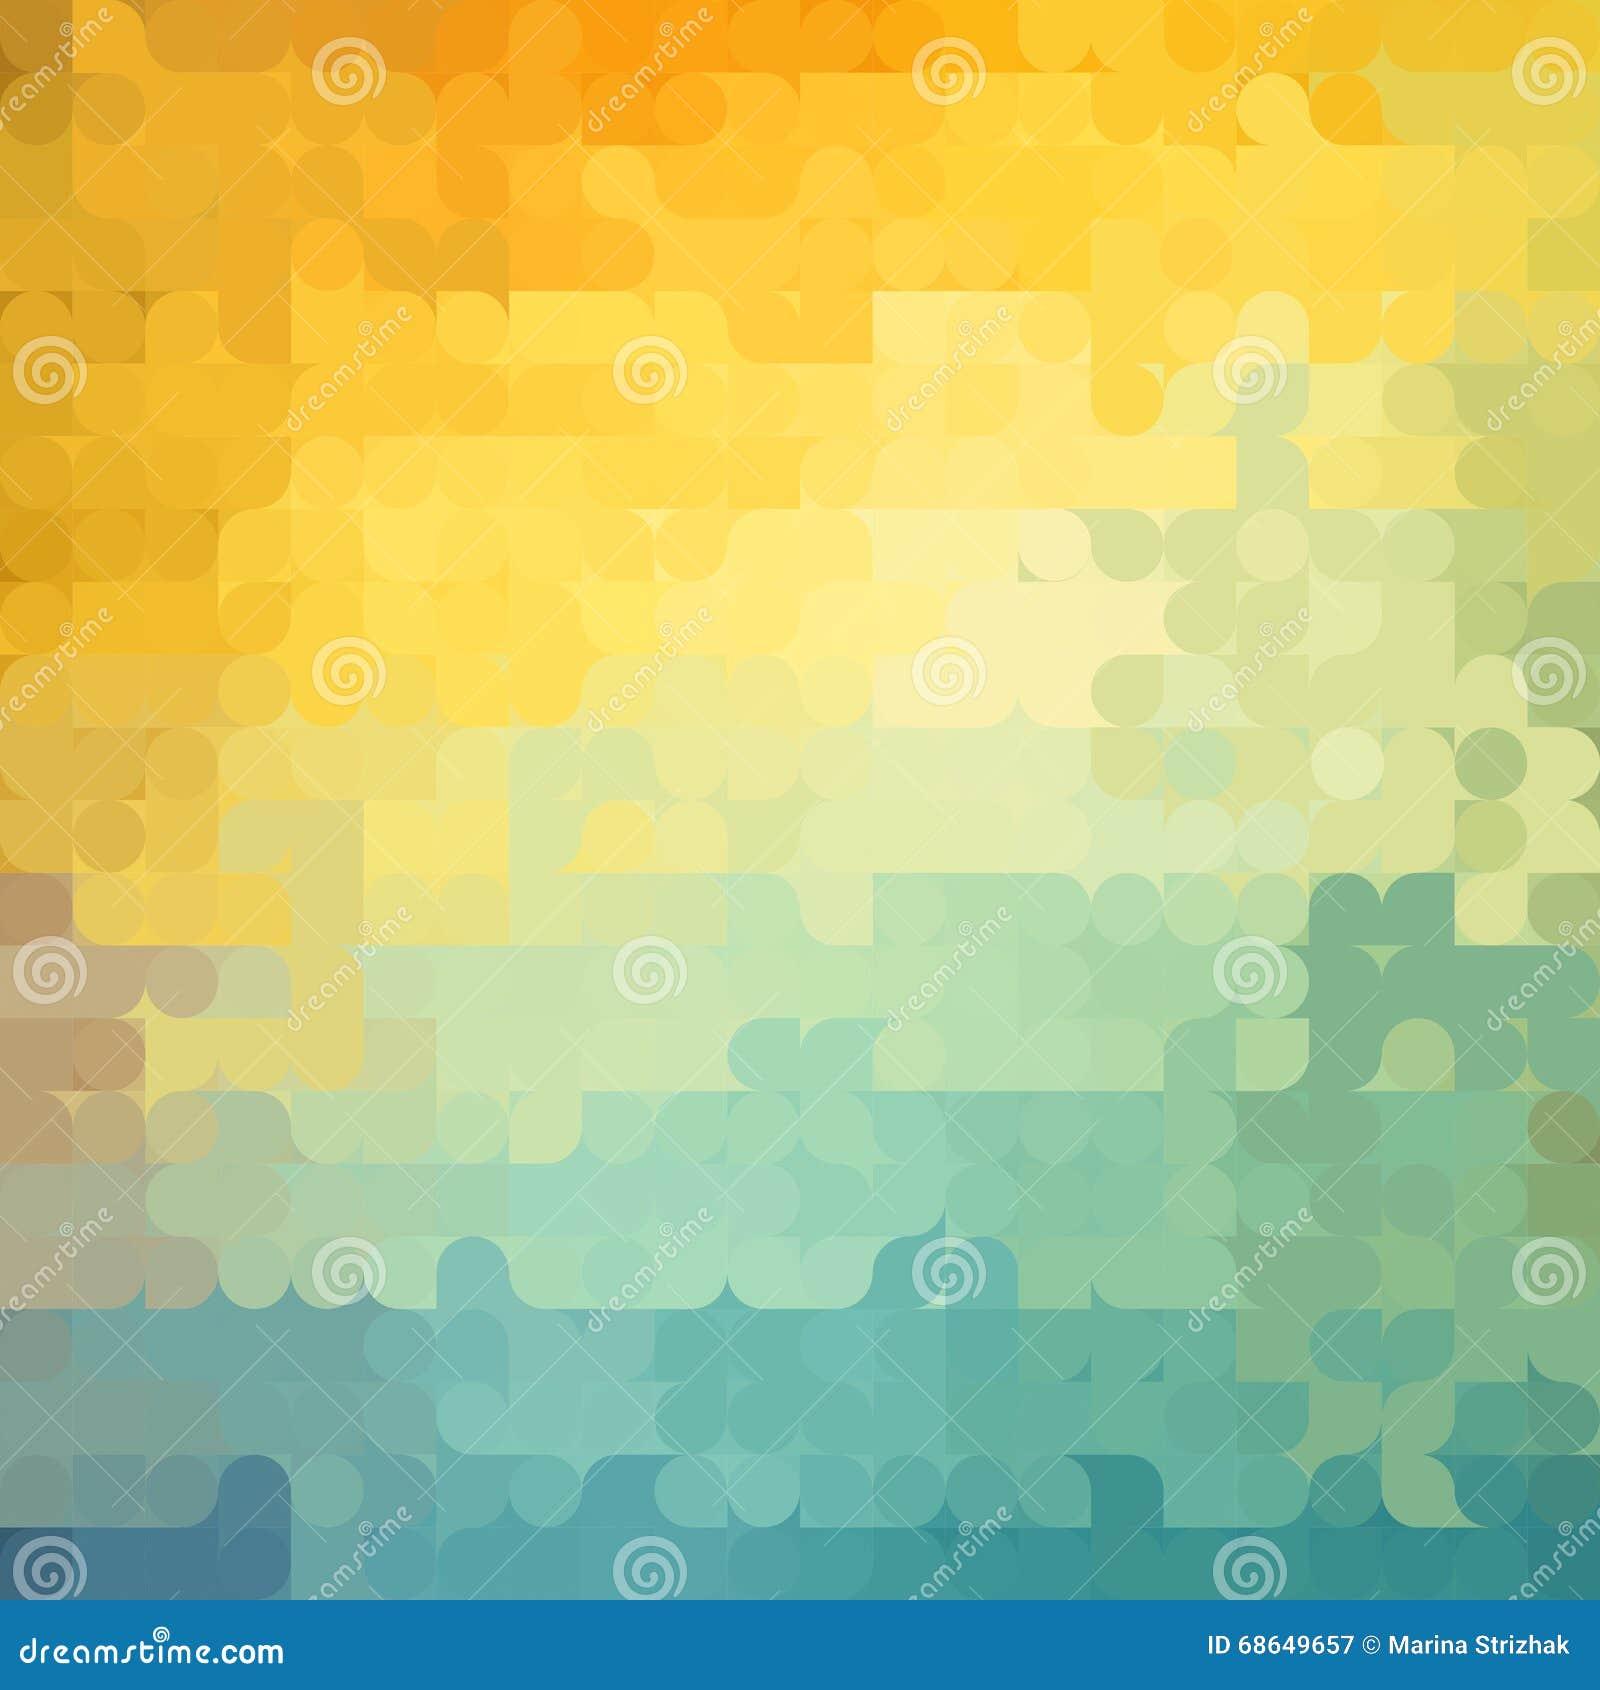 geometric yellow background illustration - photo #20